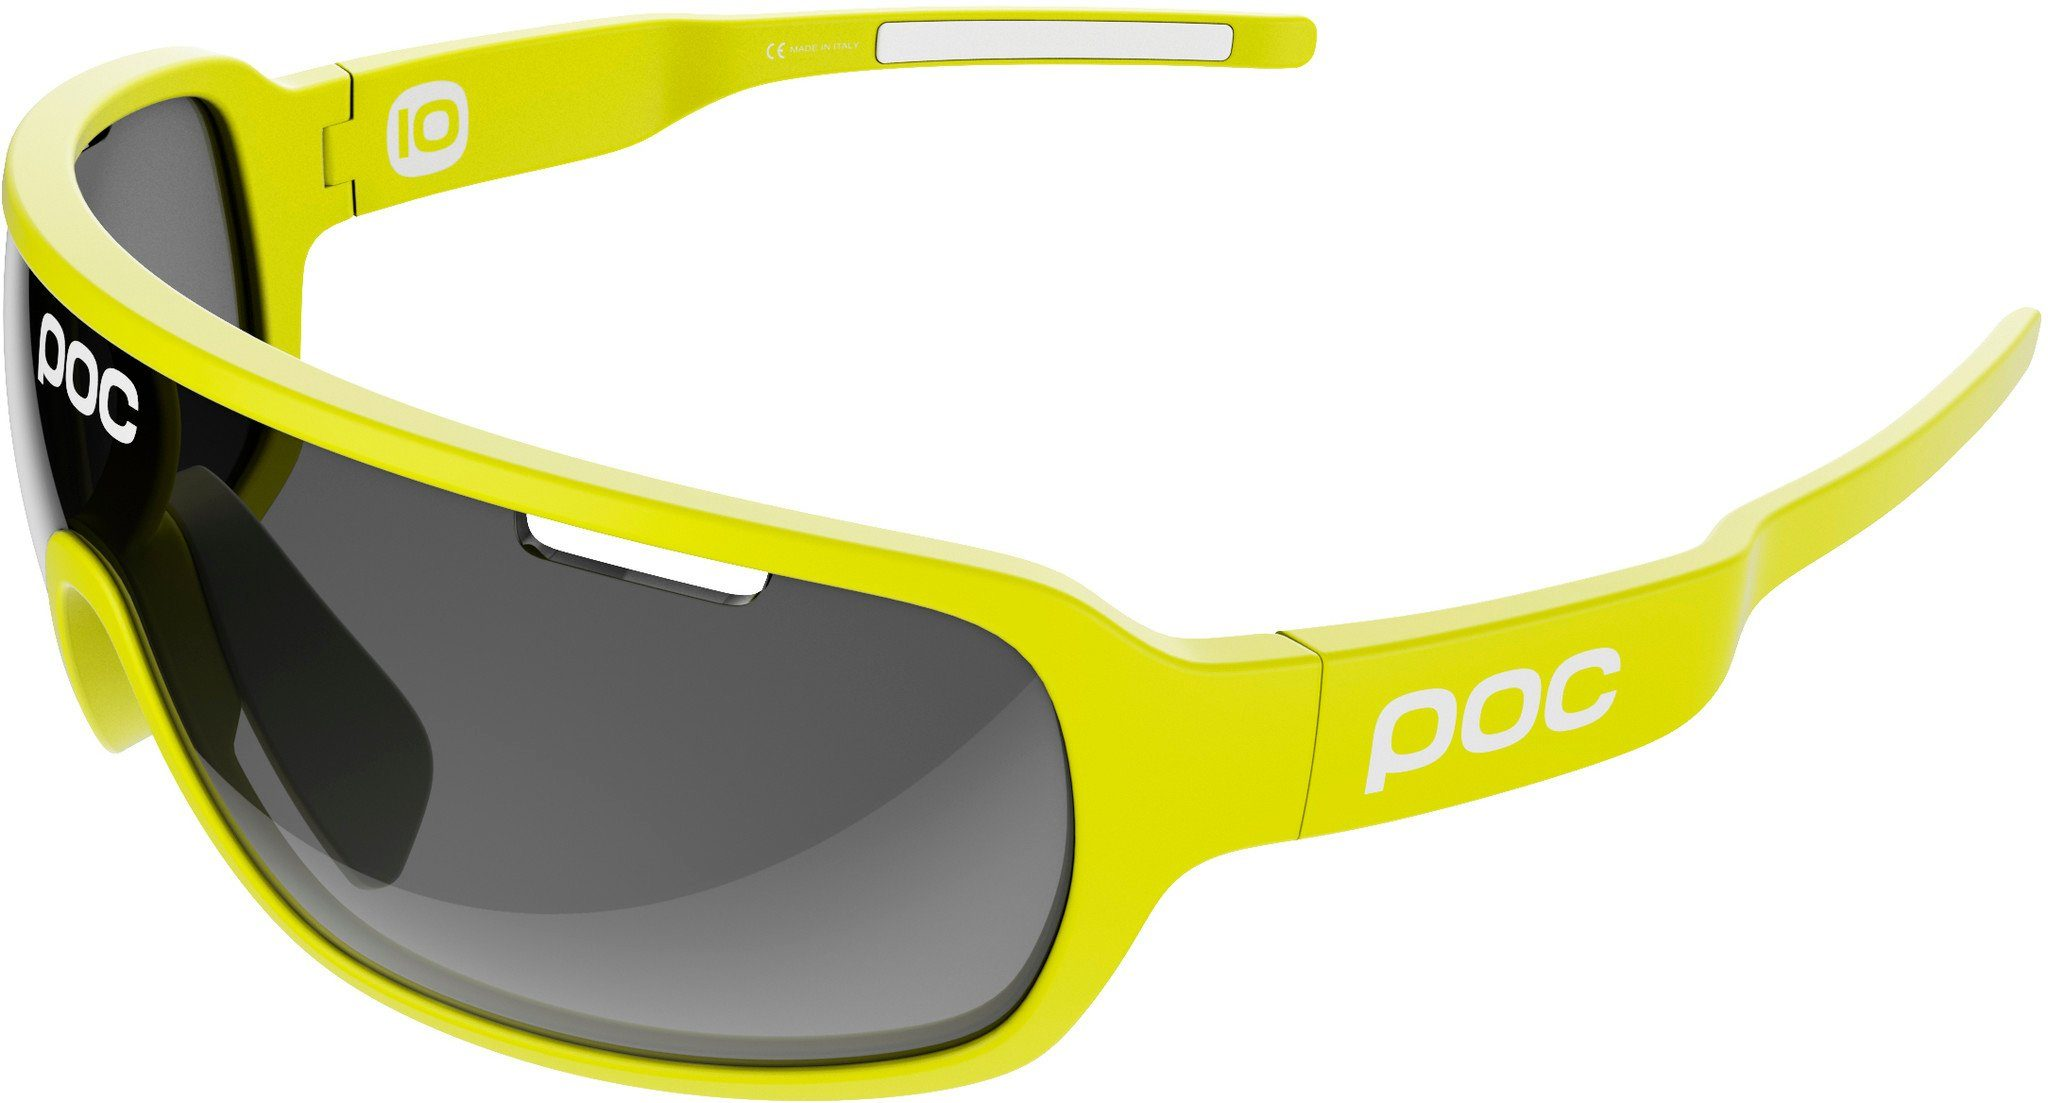 POC Radsportbrille »DO Blade Glasses«